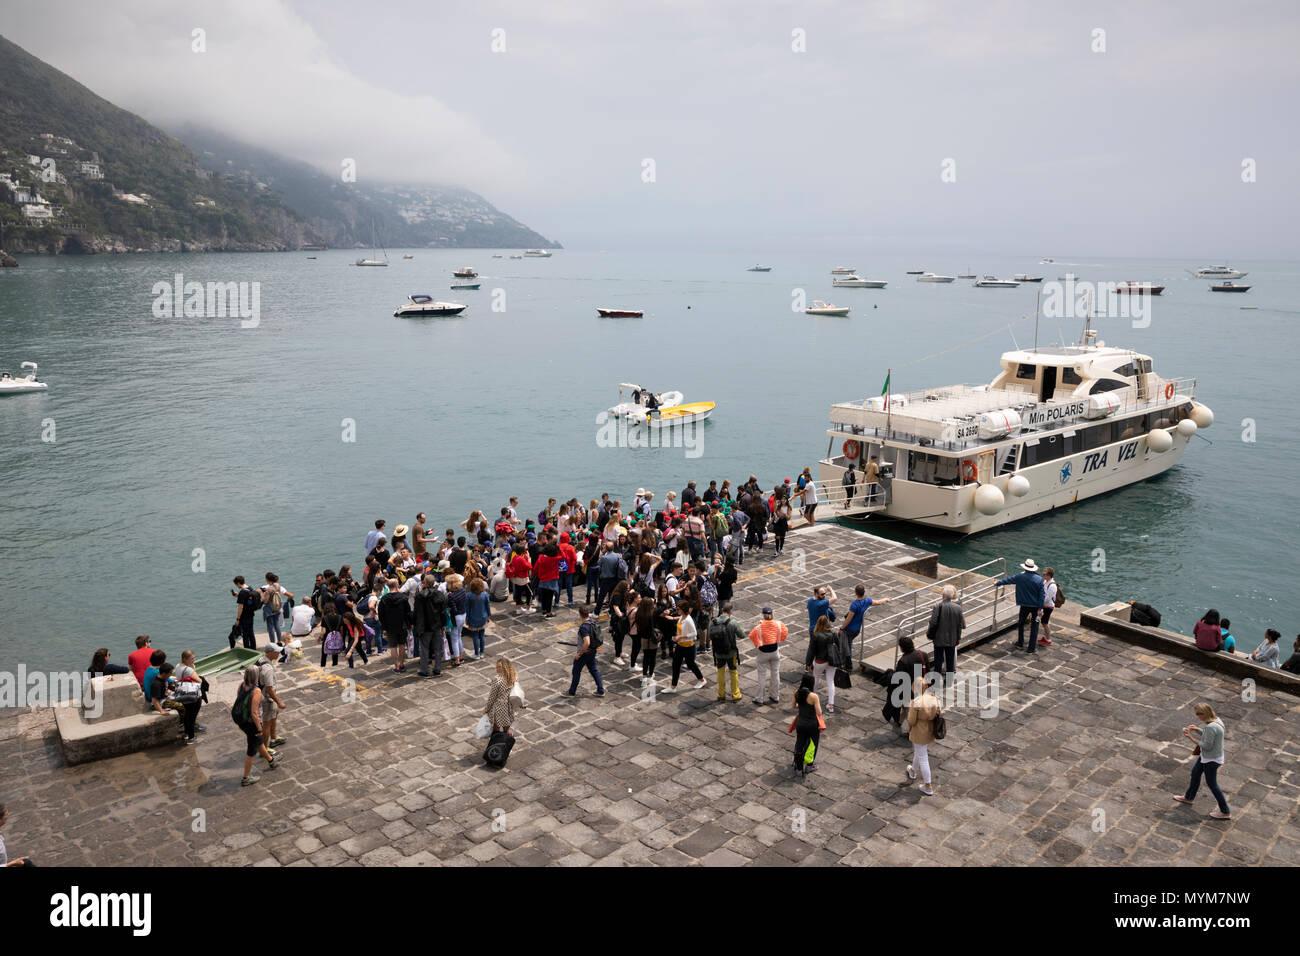 Tourists boarding ferry, Positano, The Amalfi Coast, Campania, Italy, Europe Stock Photo